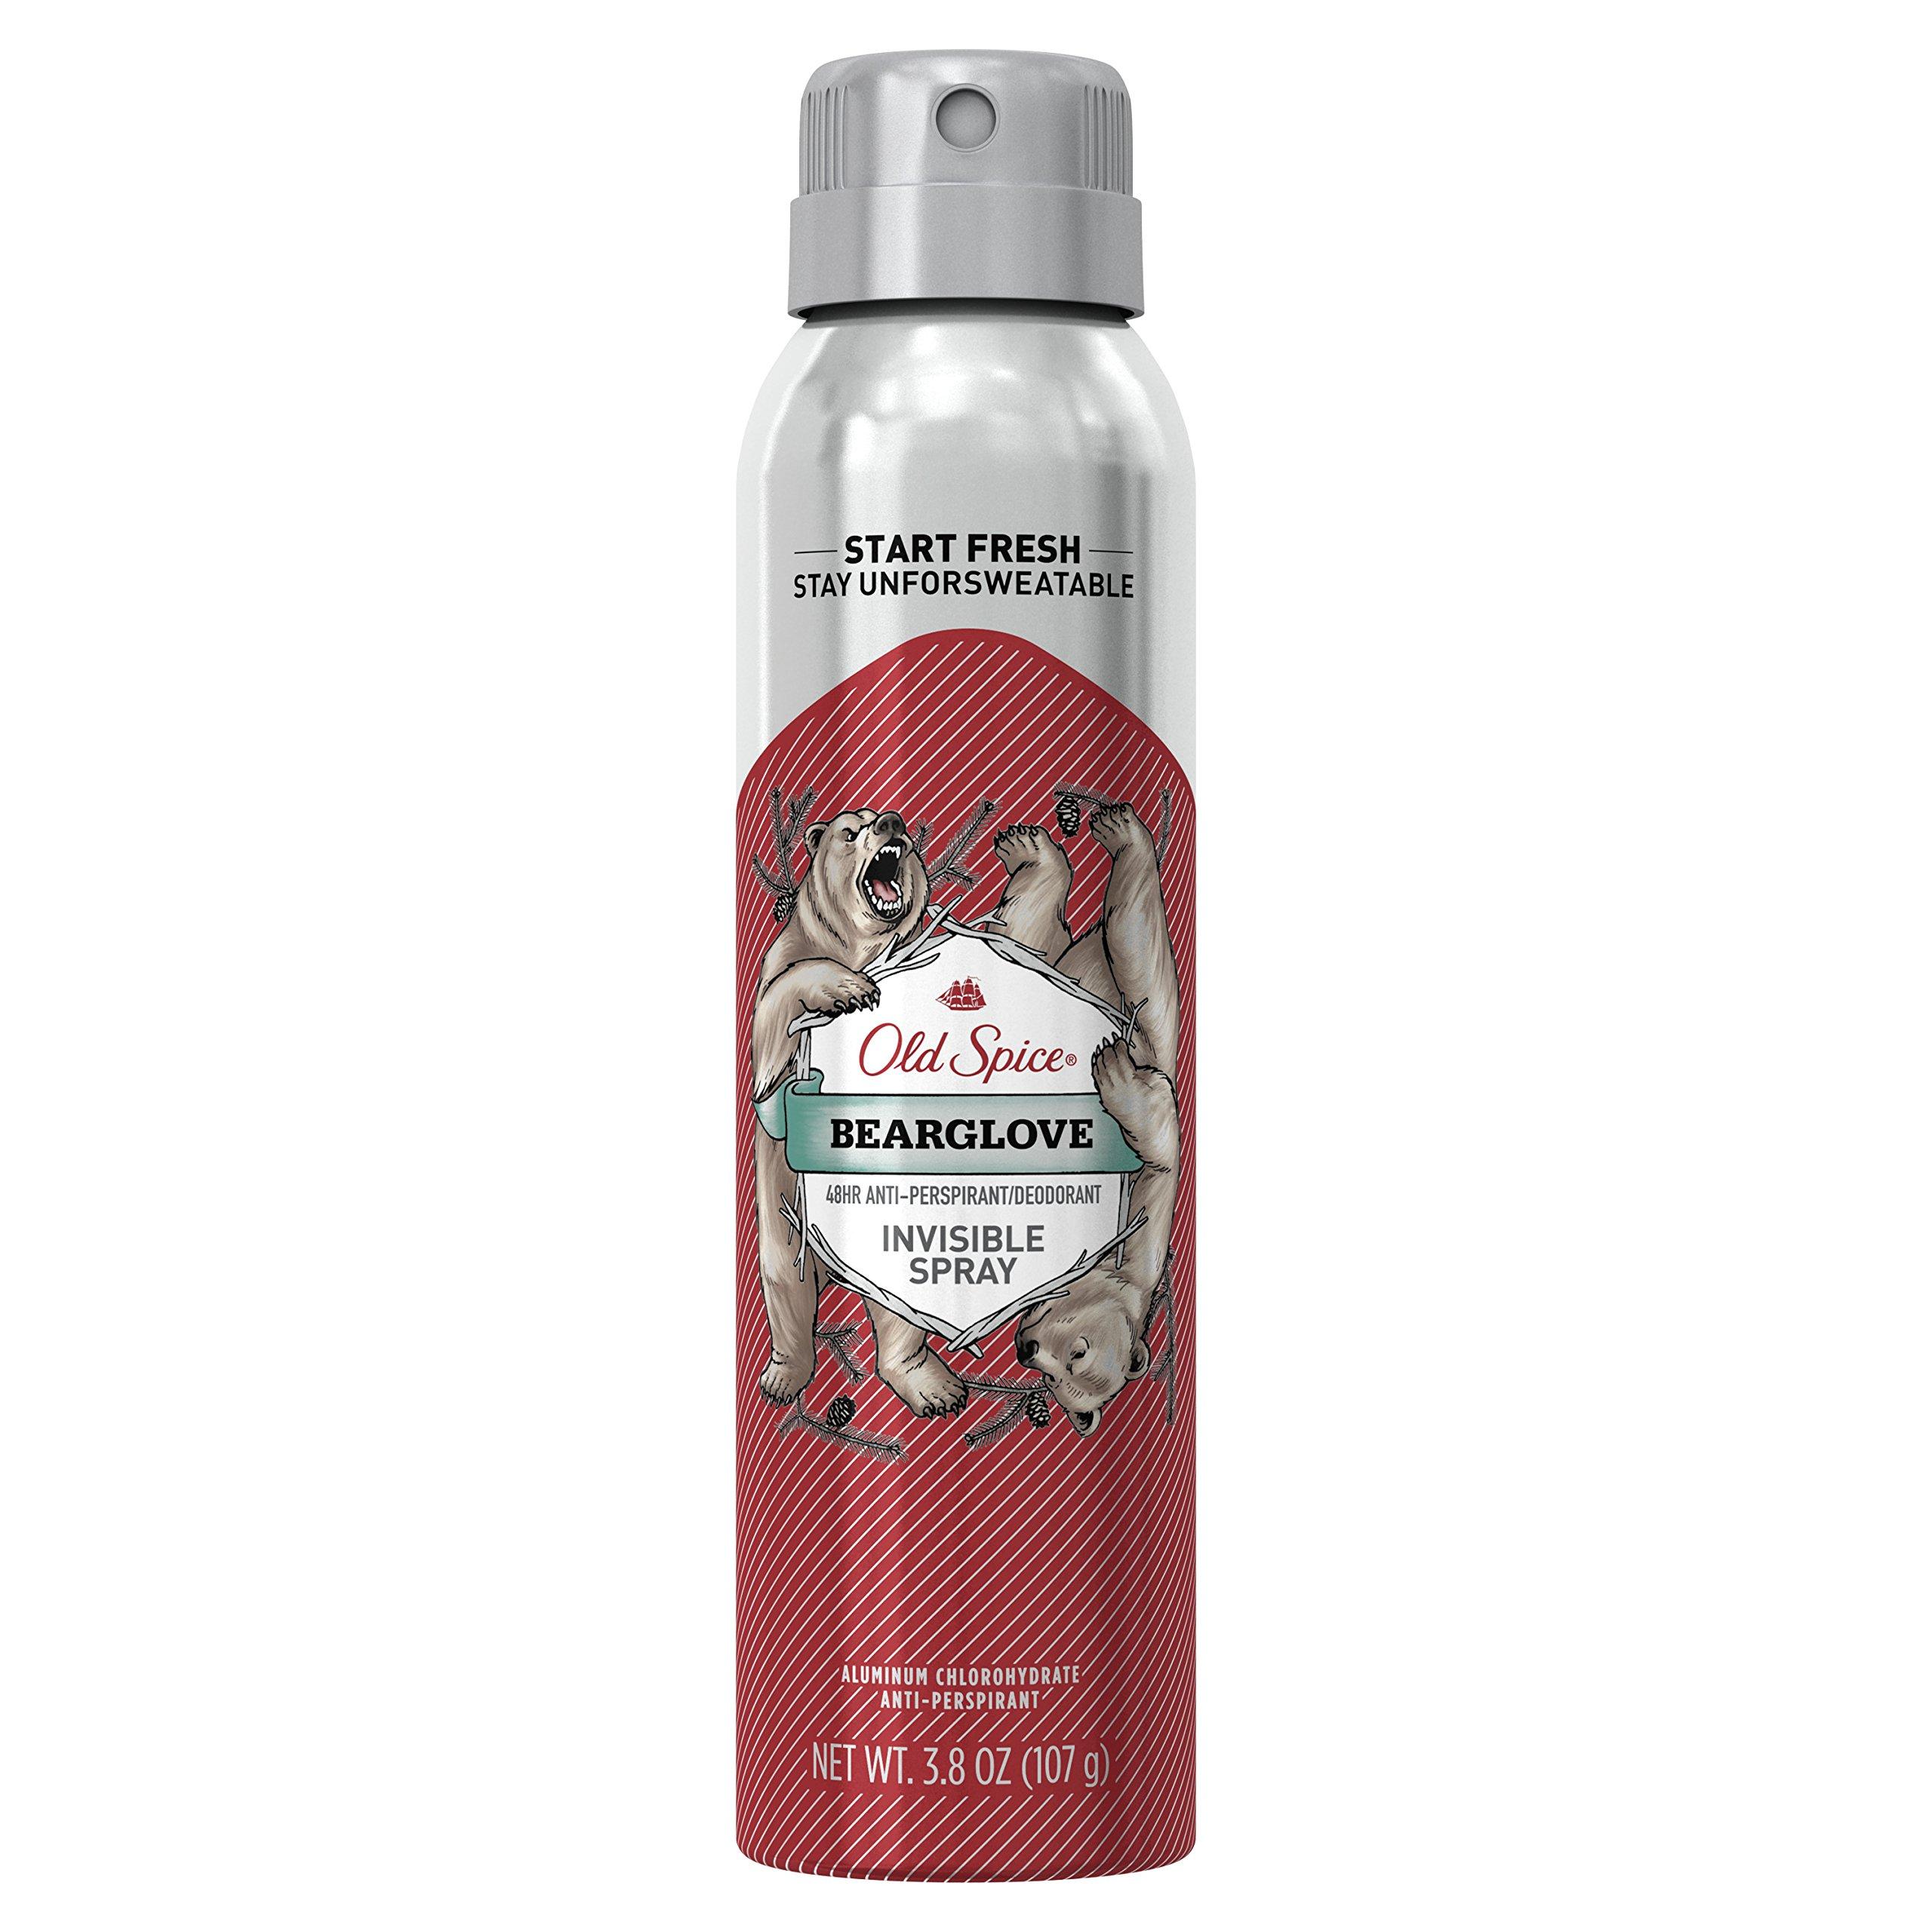 Old Spice Antiperspirant and Deodorant for Men, Invisible Spray, Bearglove, Apple, Citrus, Spice Scent, 3.8 Oz